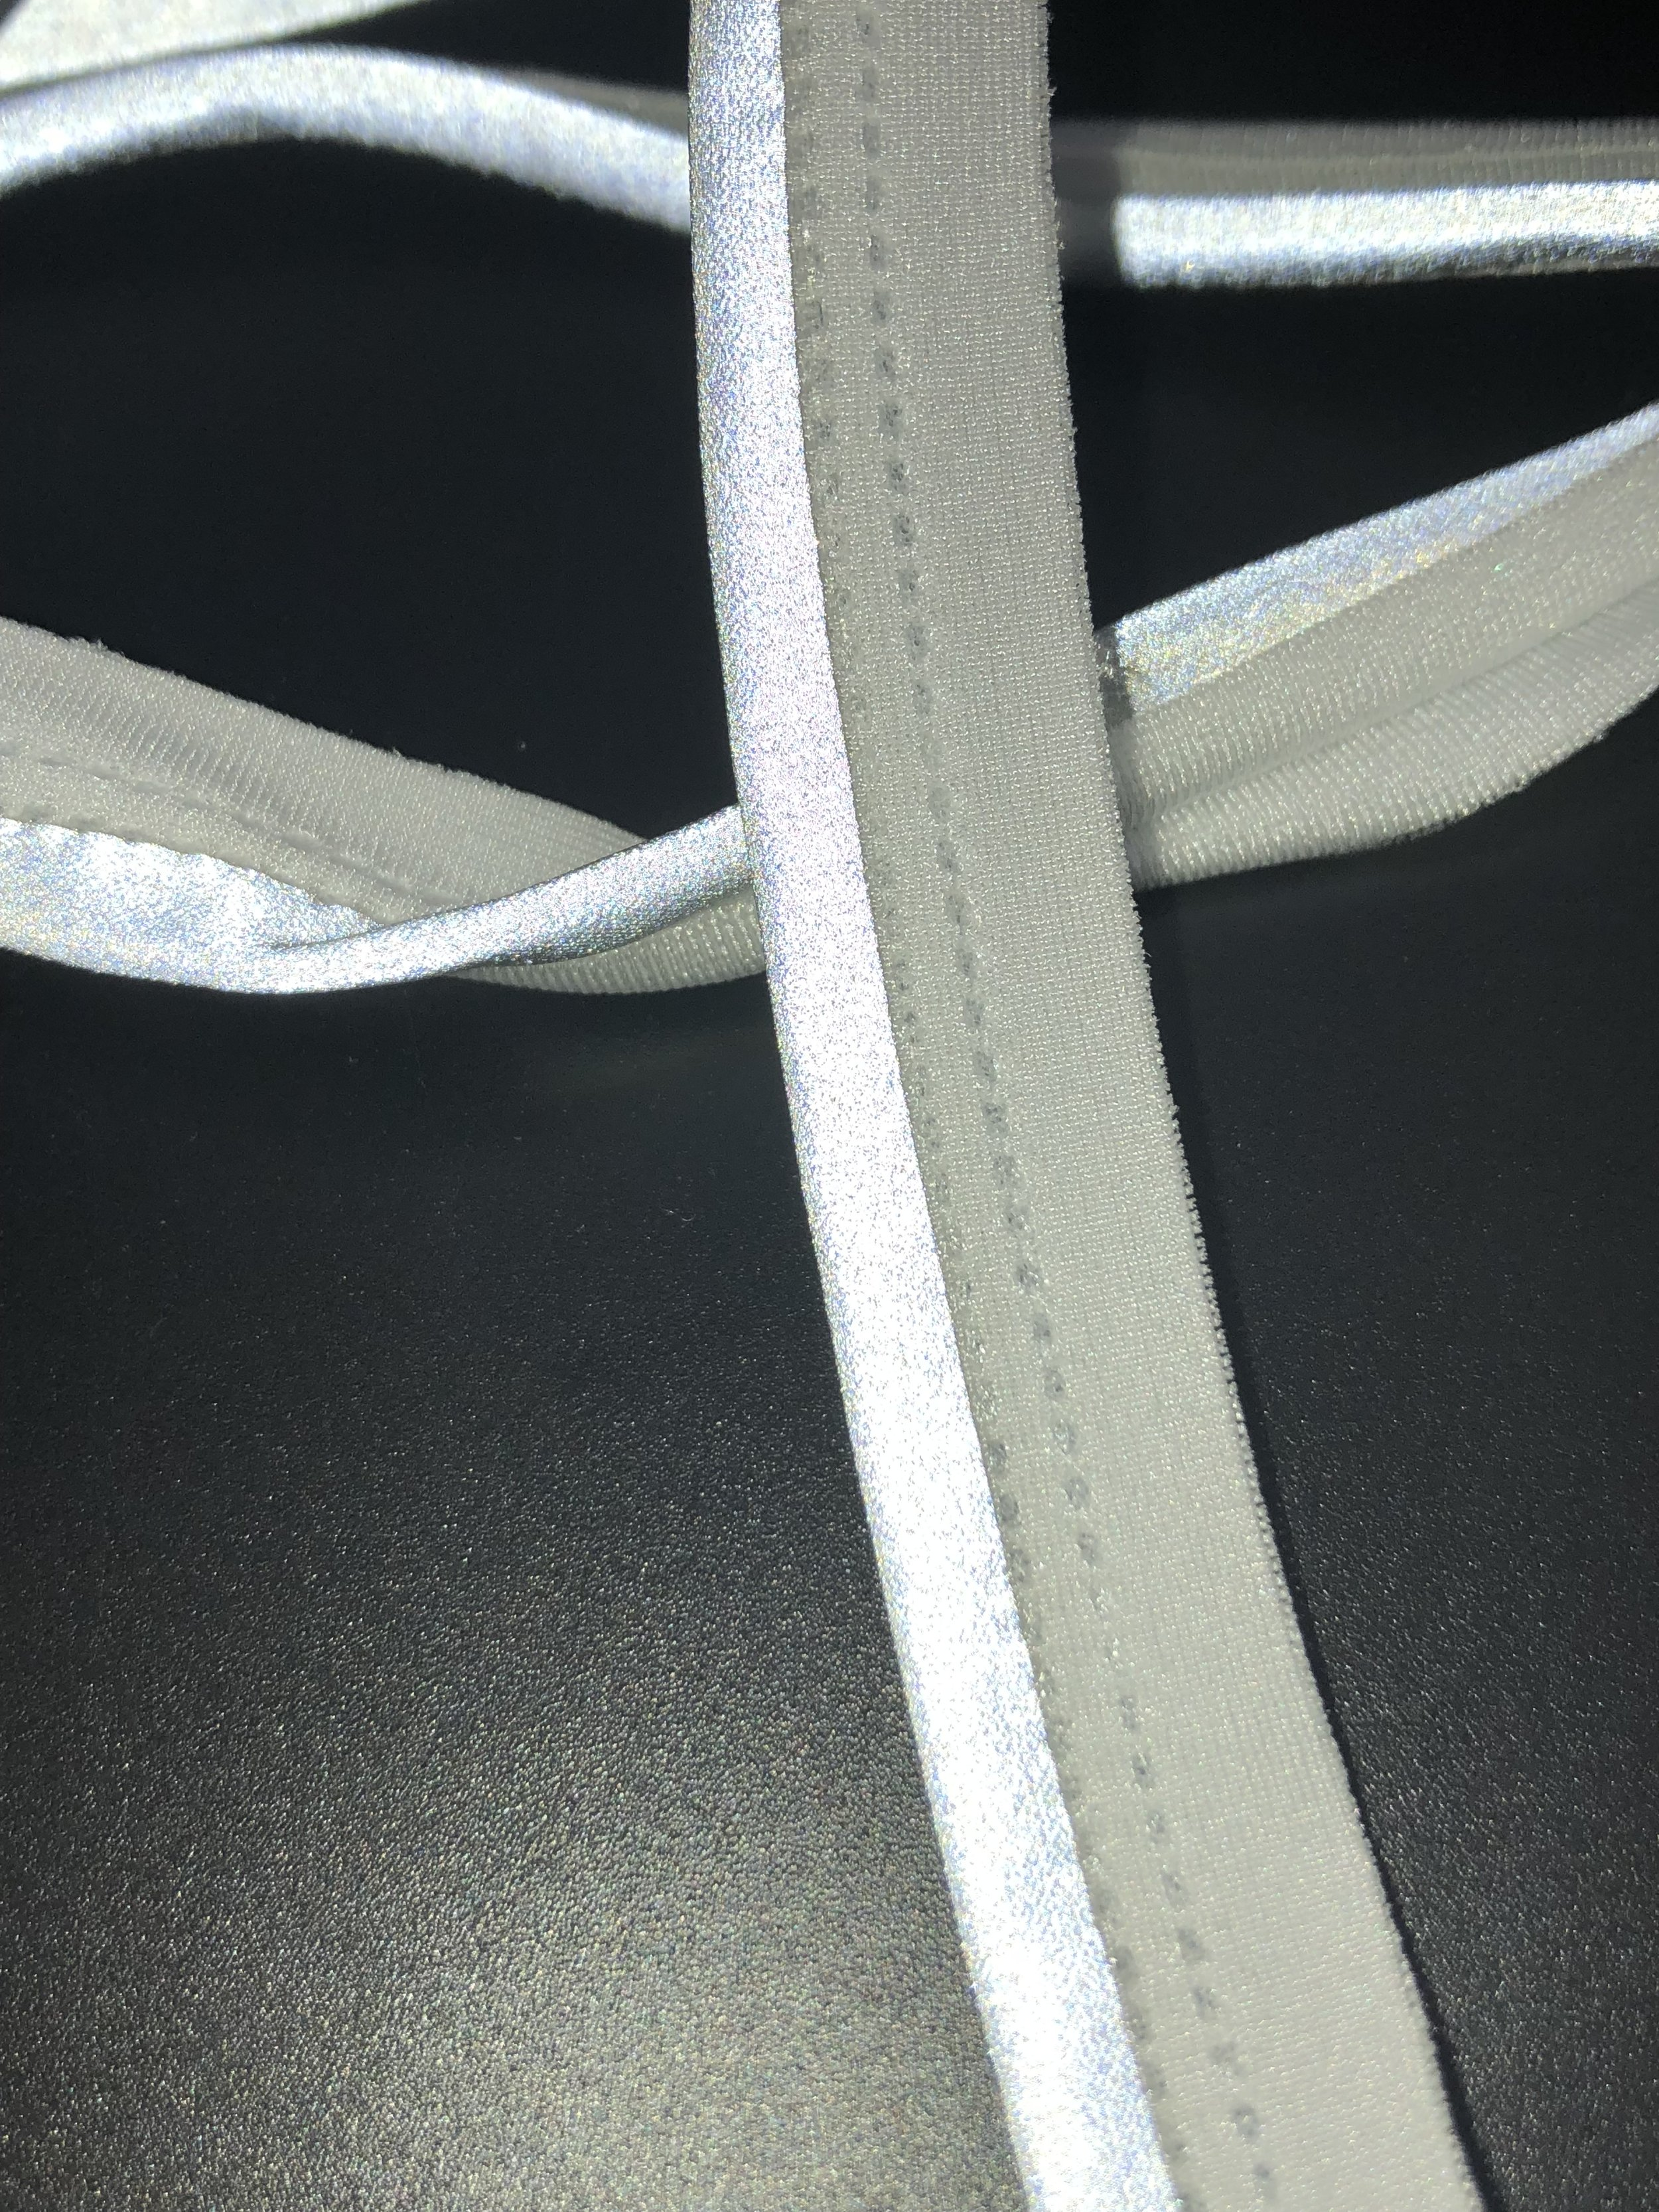 Copy of 3M Elastic Reflective Piping - Flash